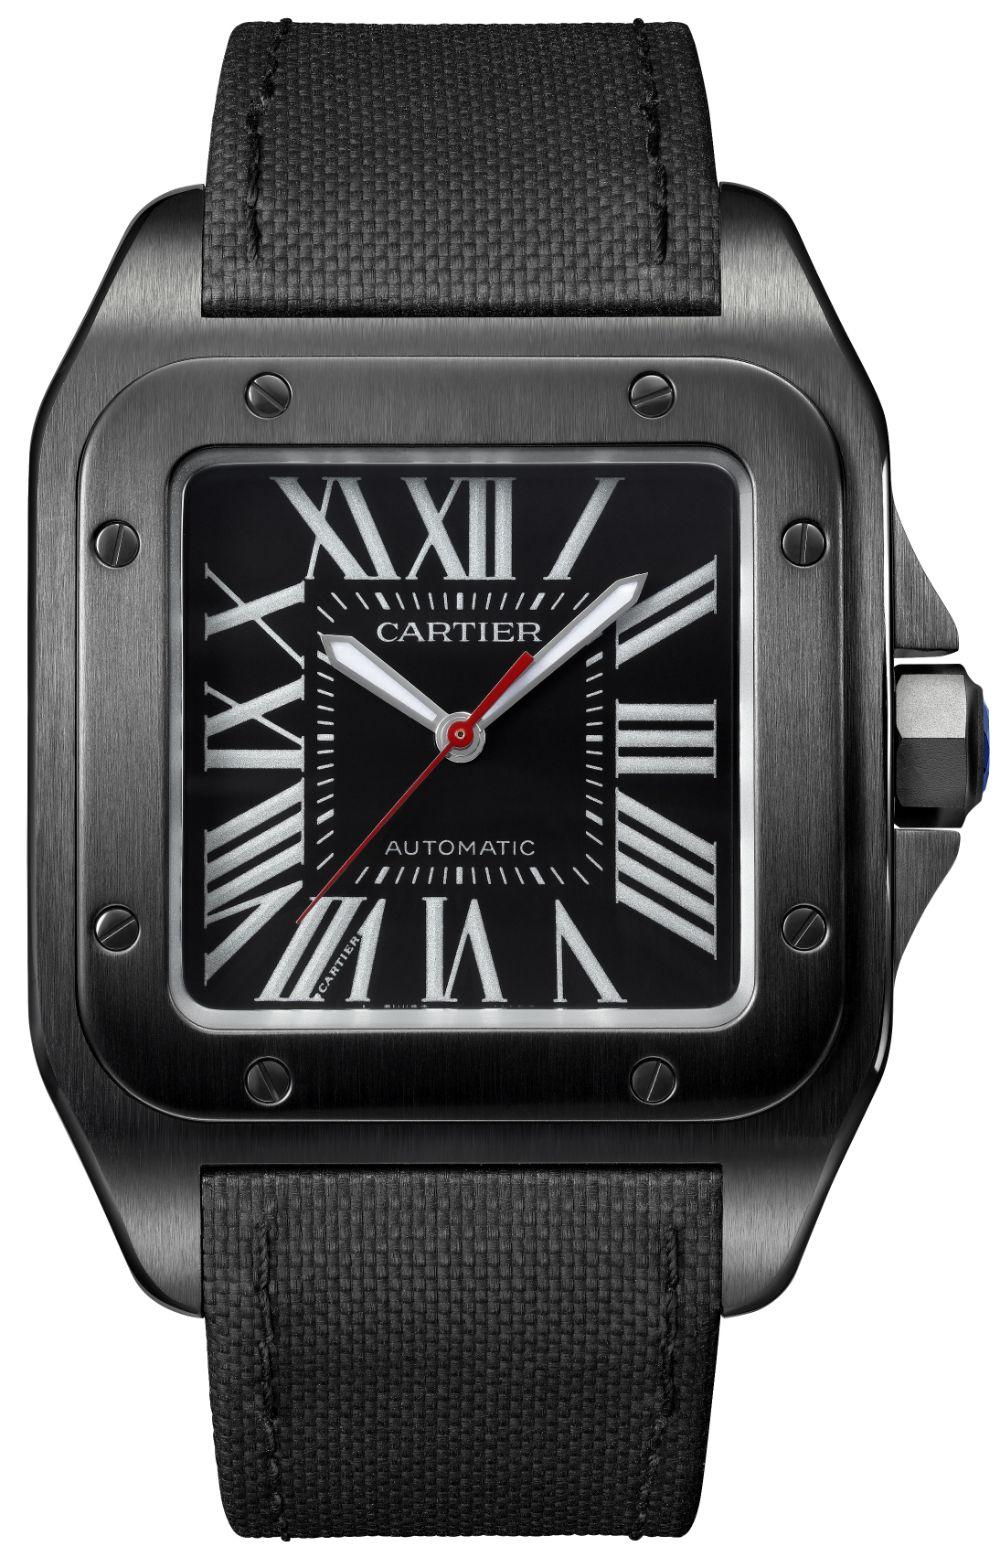 84d1b42f143 Cartier Santos 100 Carbon   Ballon Bleu De Cartier Carbon Watches Watch  Releases